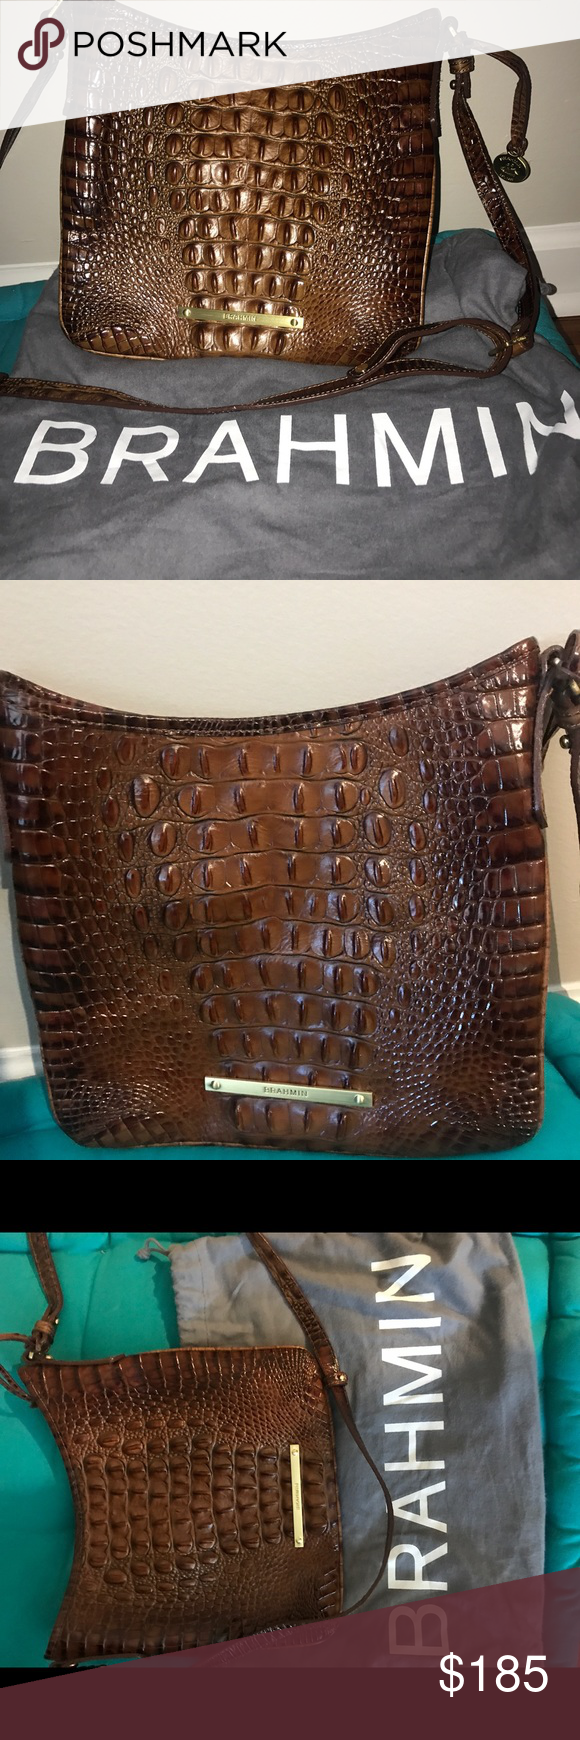 Spotted while shopping on Poshmark  Brahmin Bag!  poshmark  fashion   shopping  style  Brahmin  Handbags 14f2688e85